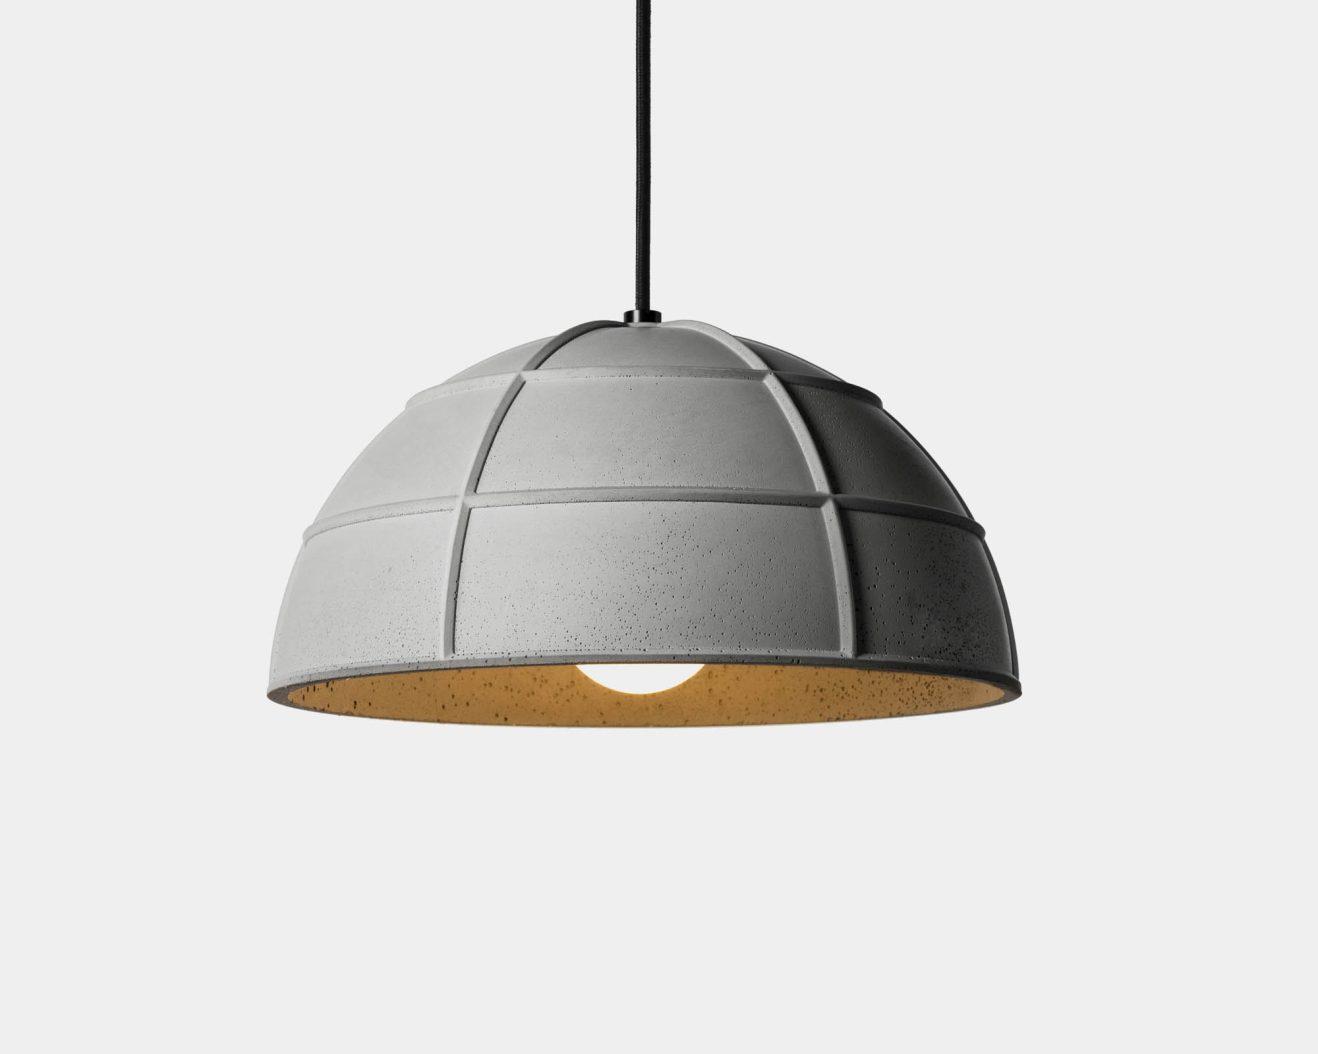 Leng-BentuDesign-pendantlamp1